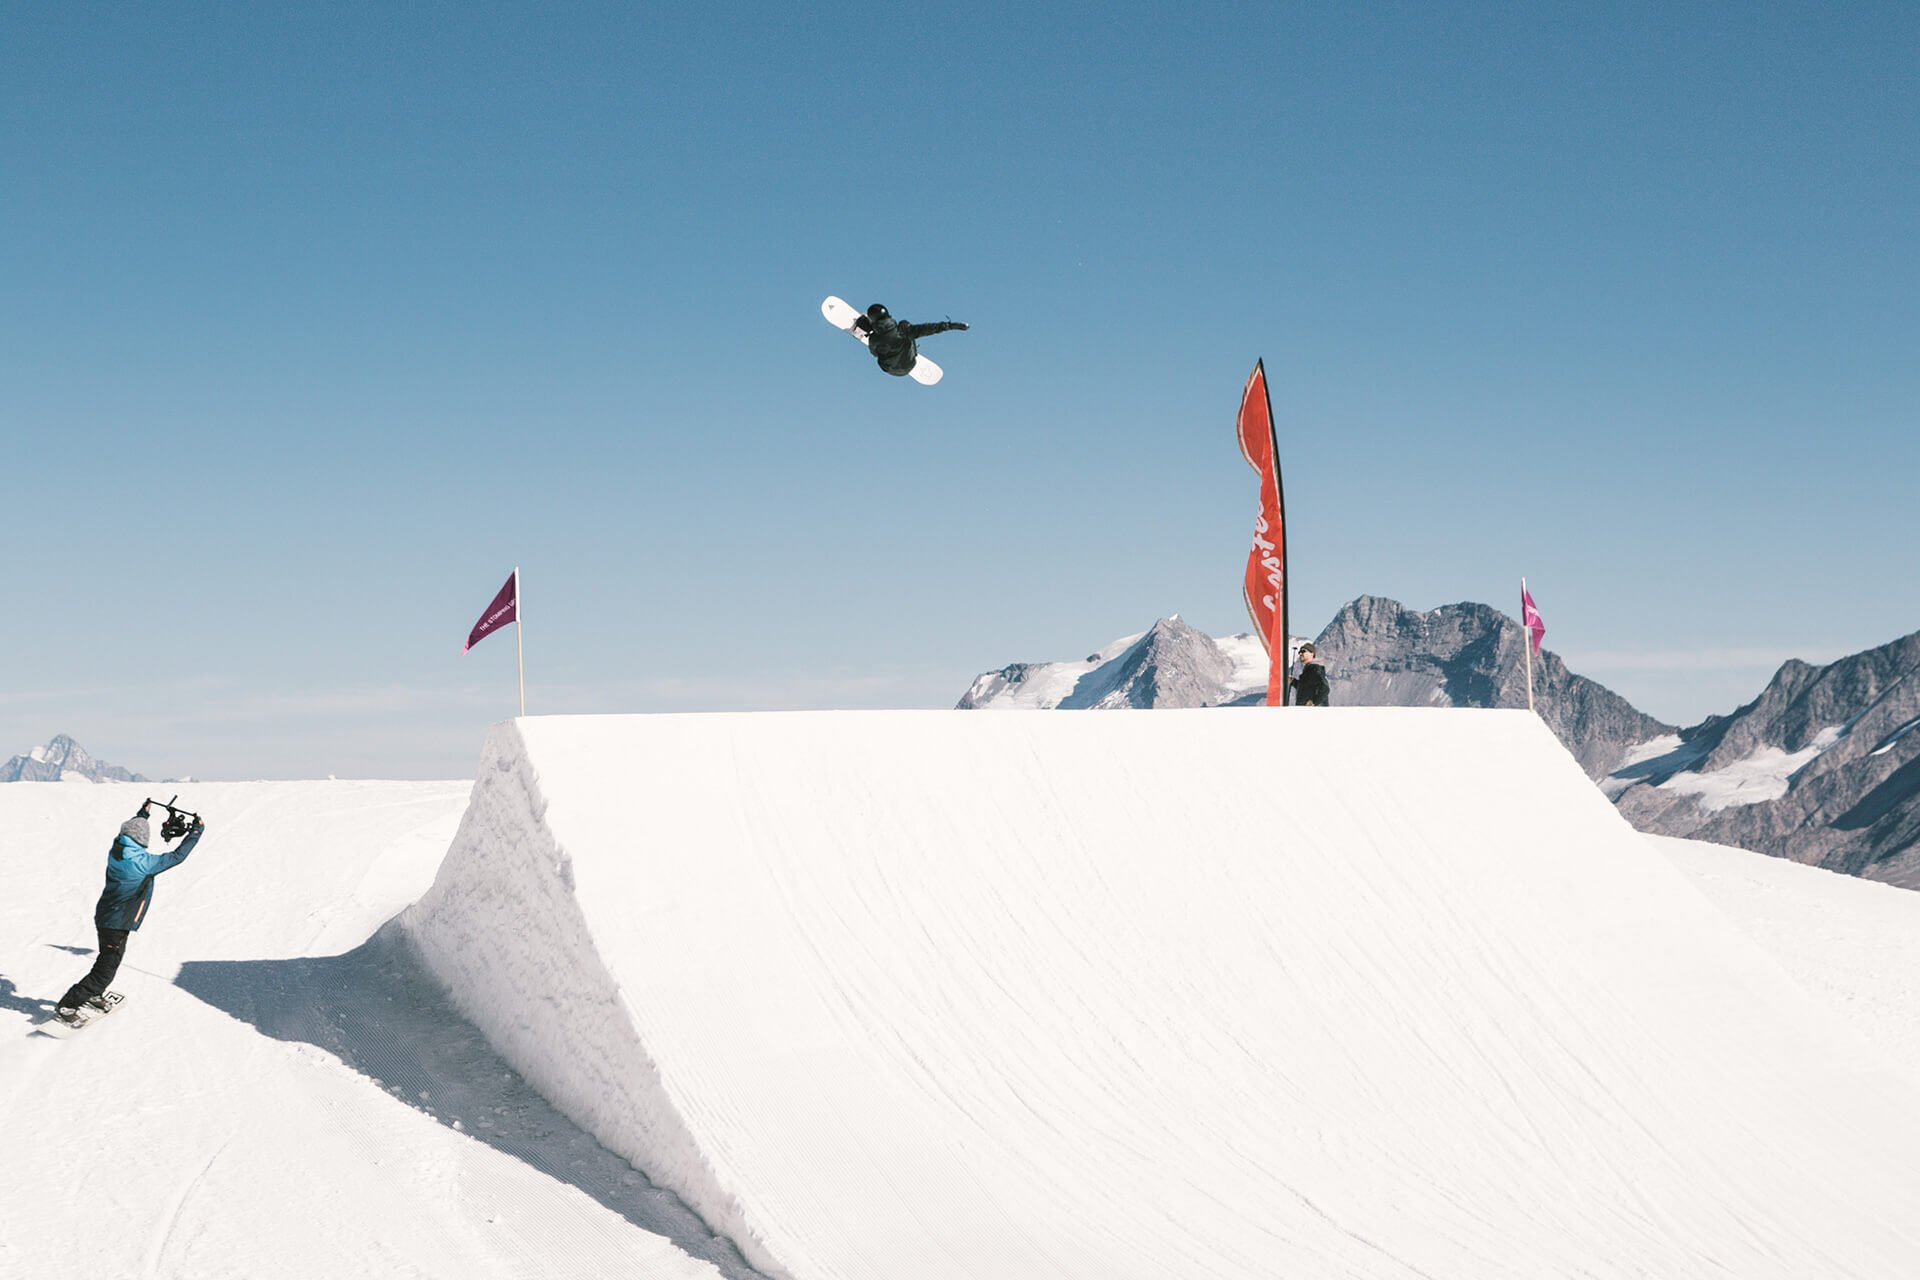 Clemens Millauer: Air